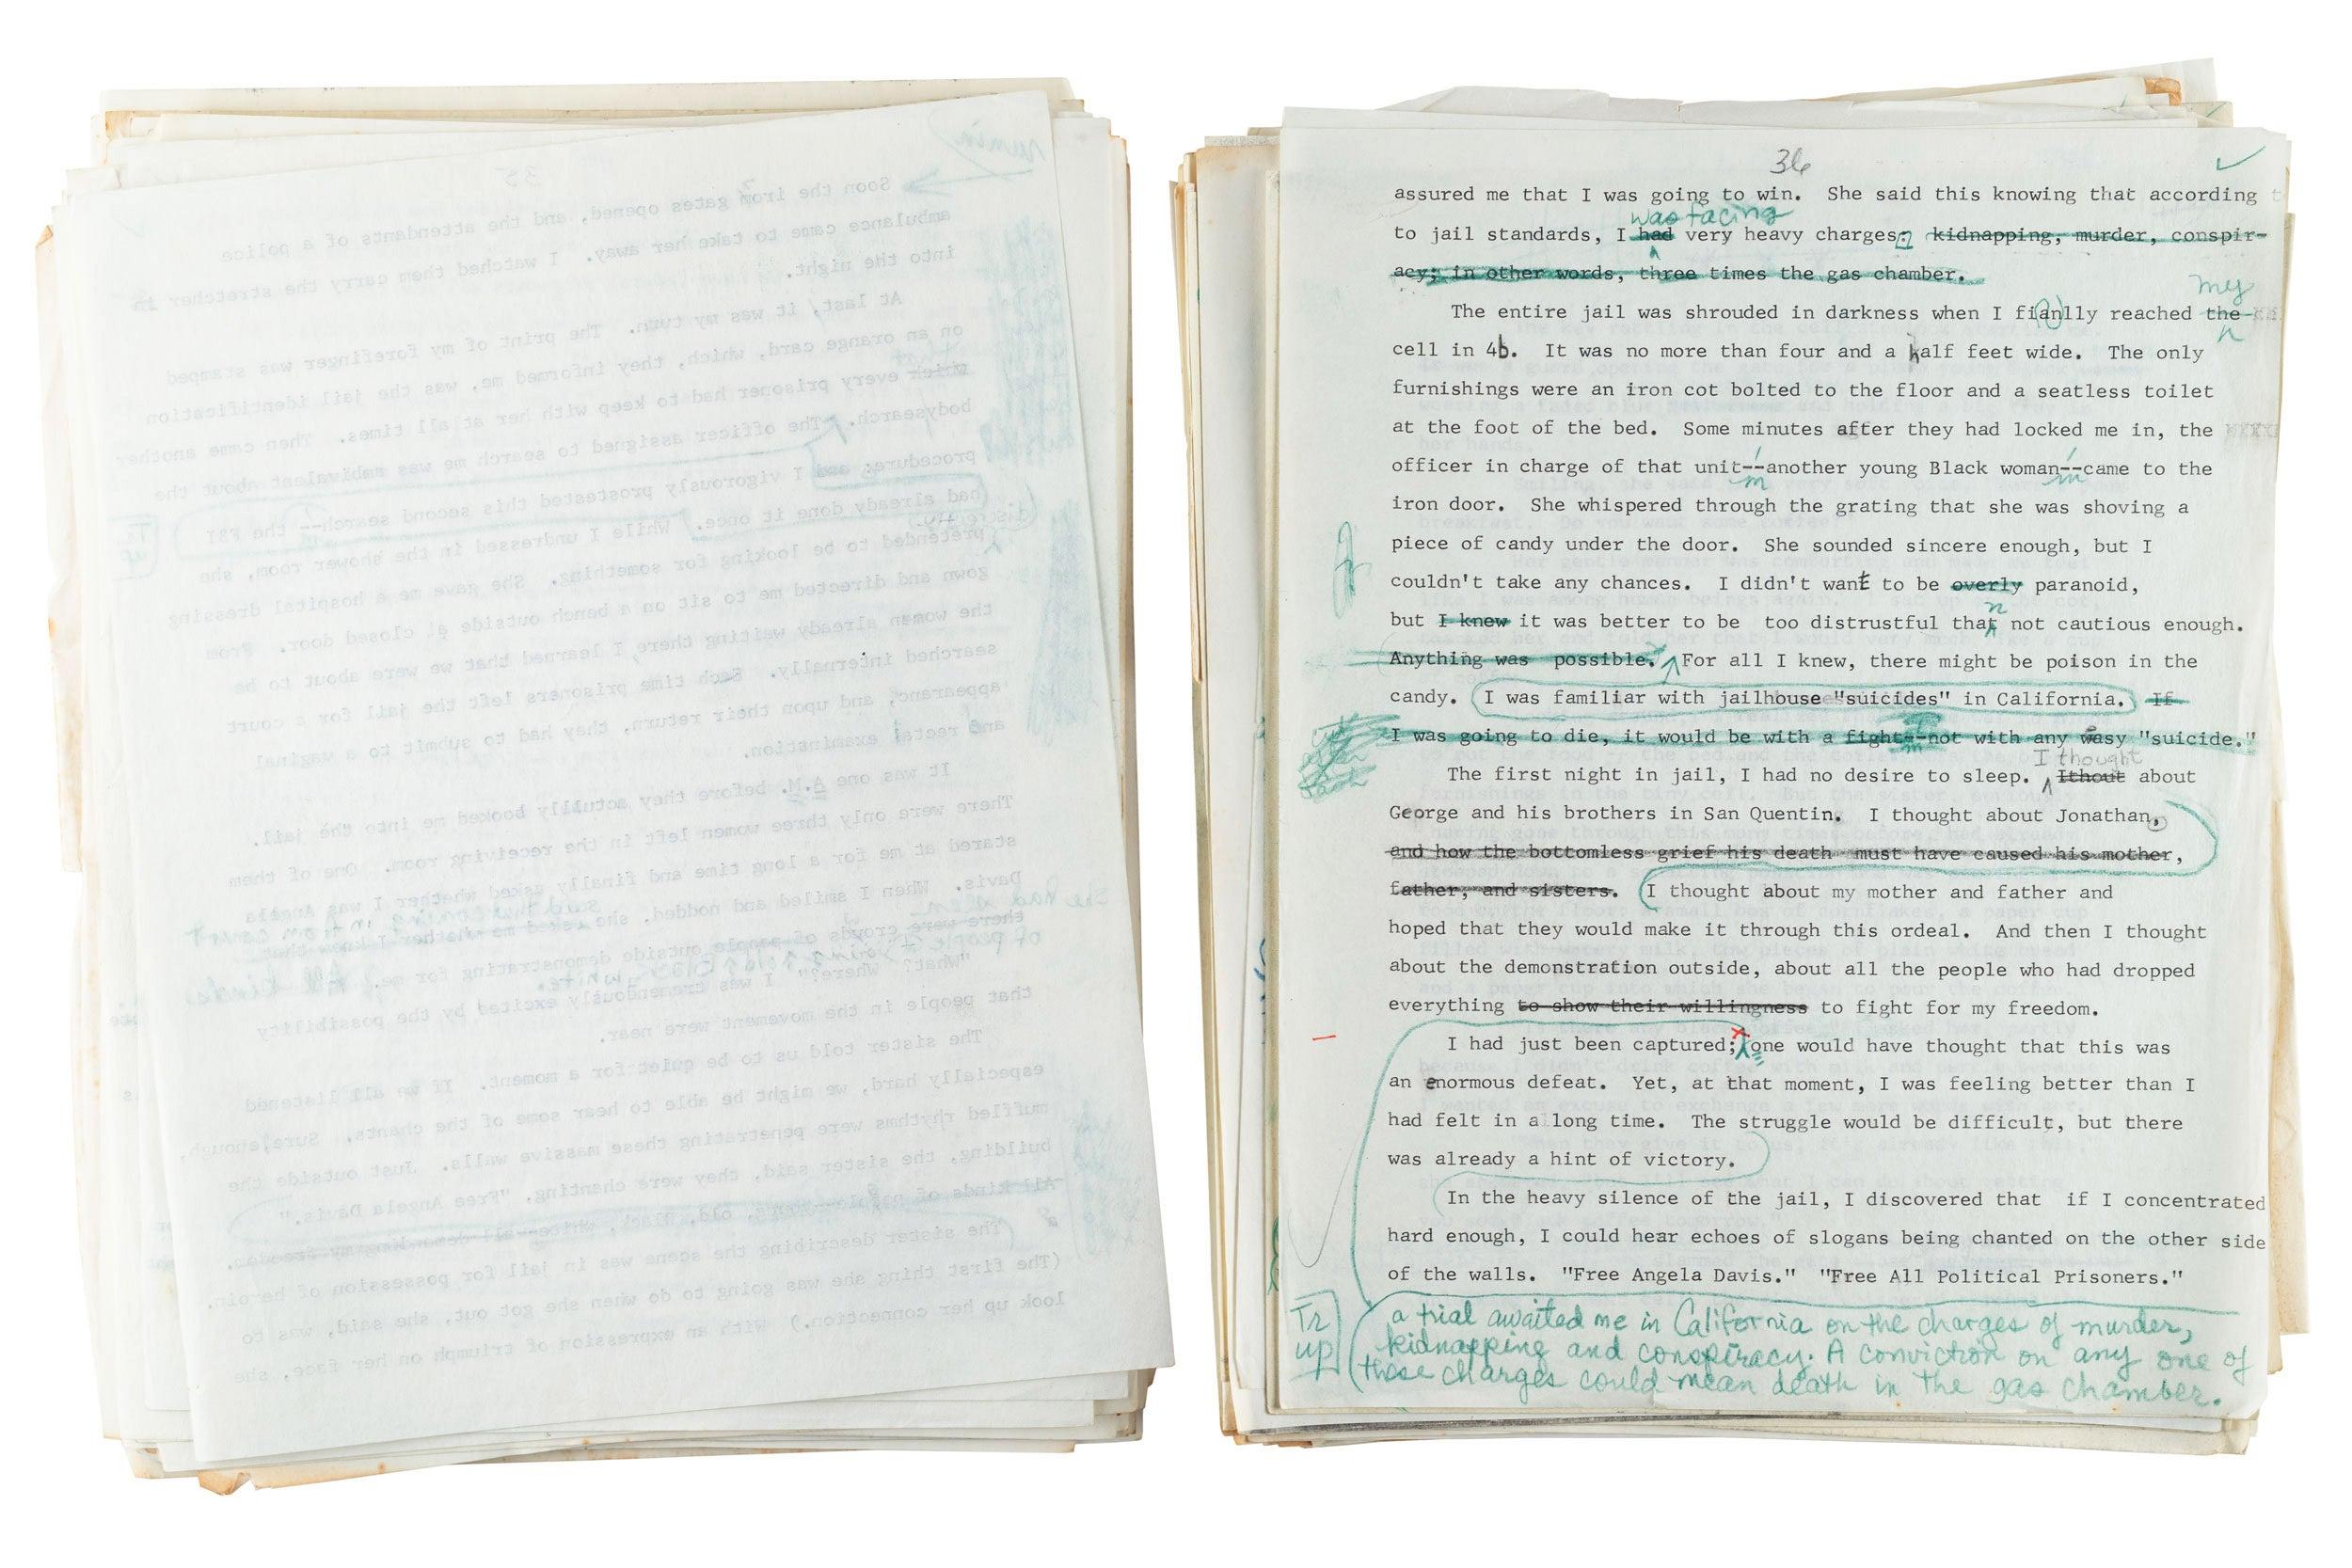 A manuscript with edits written in blue pen.